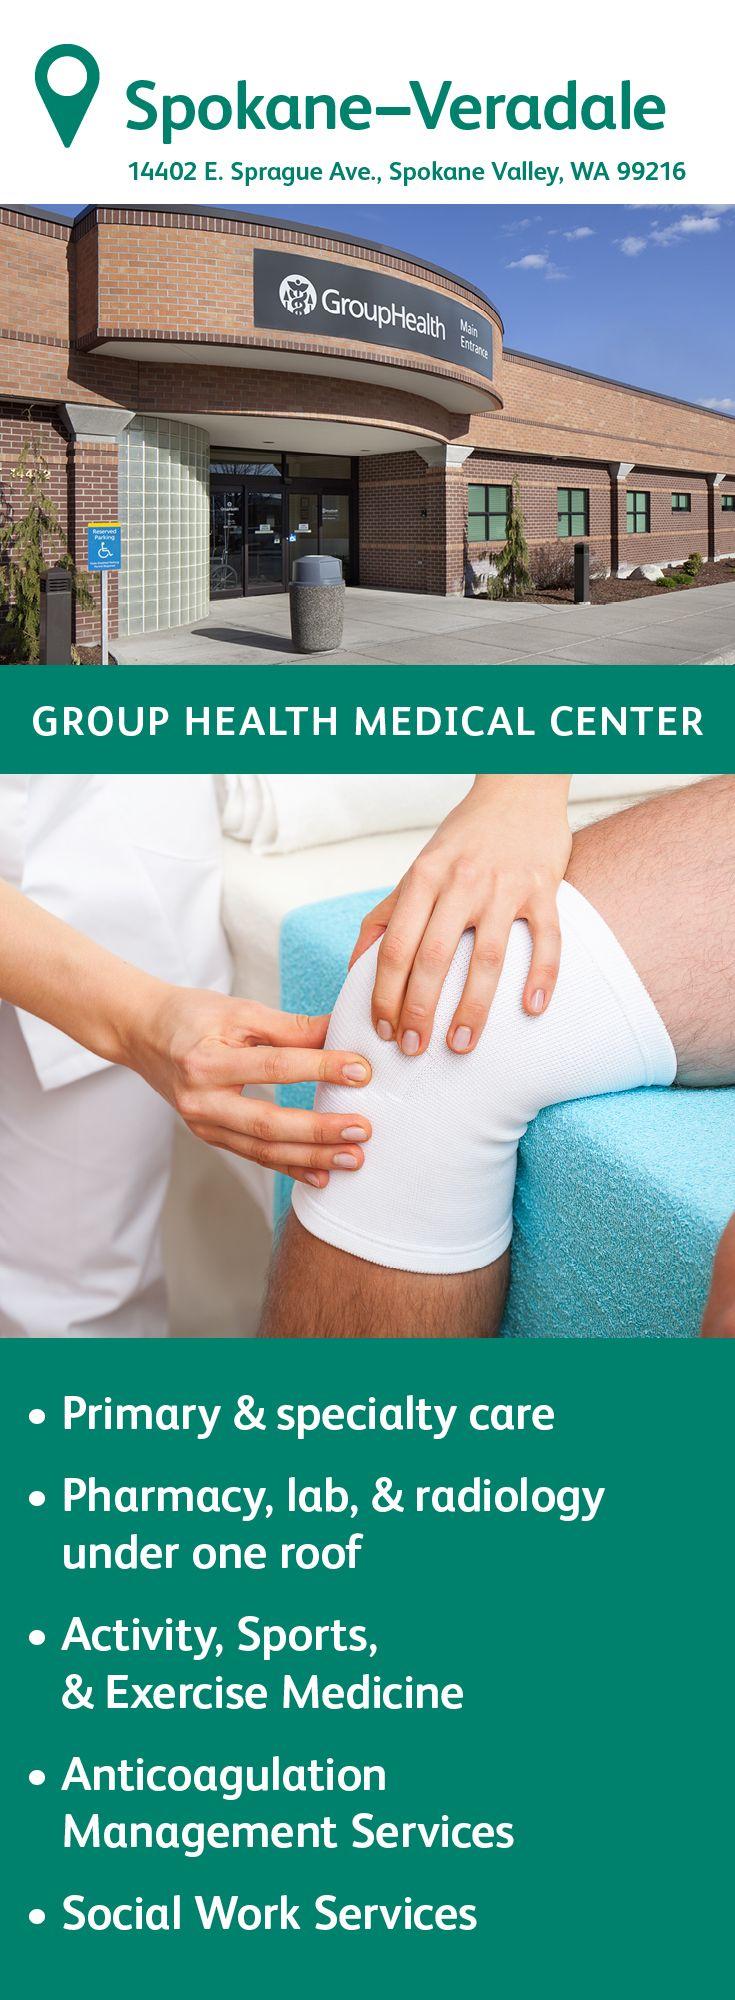 The Group Health Veradale Medical Center in Spokane